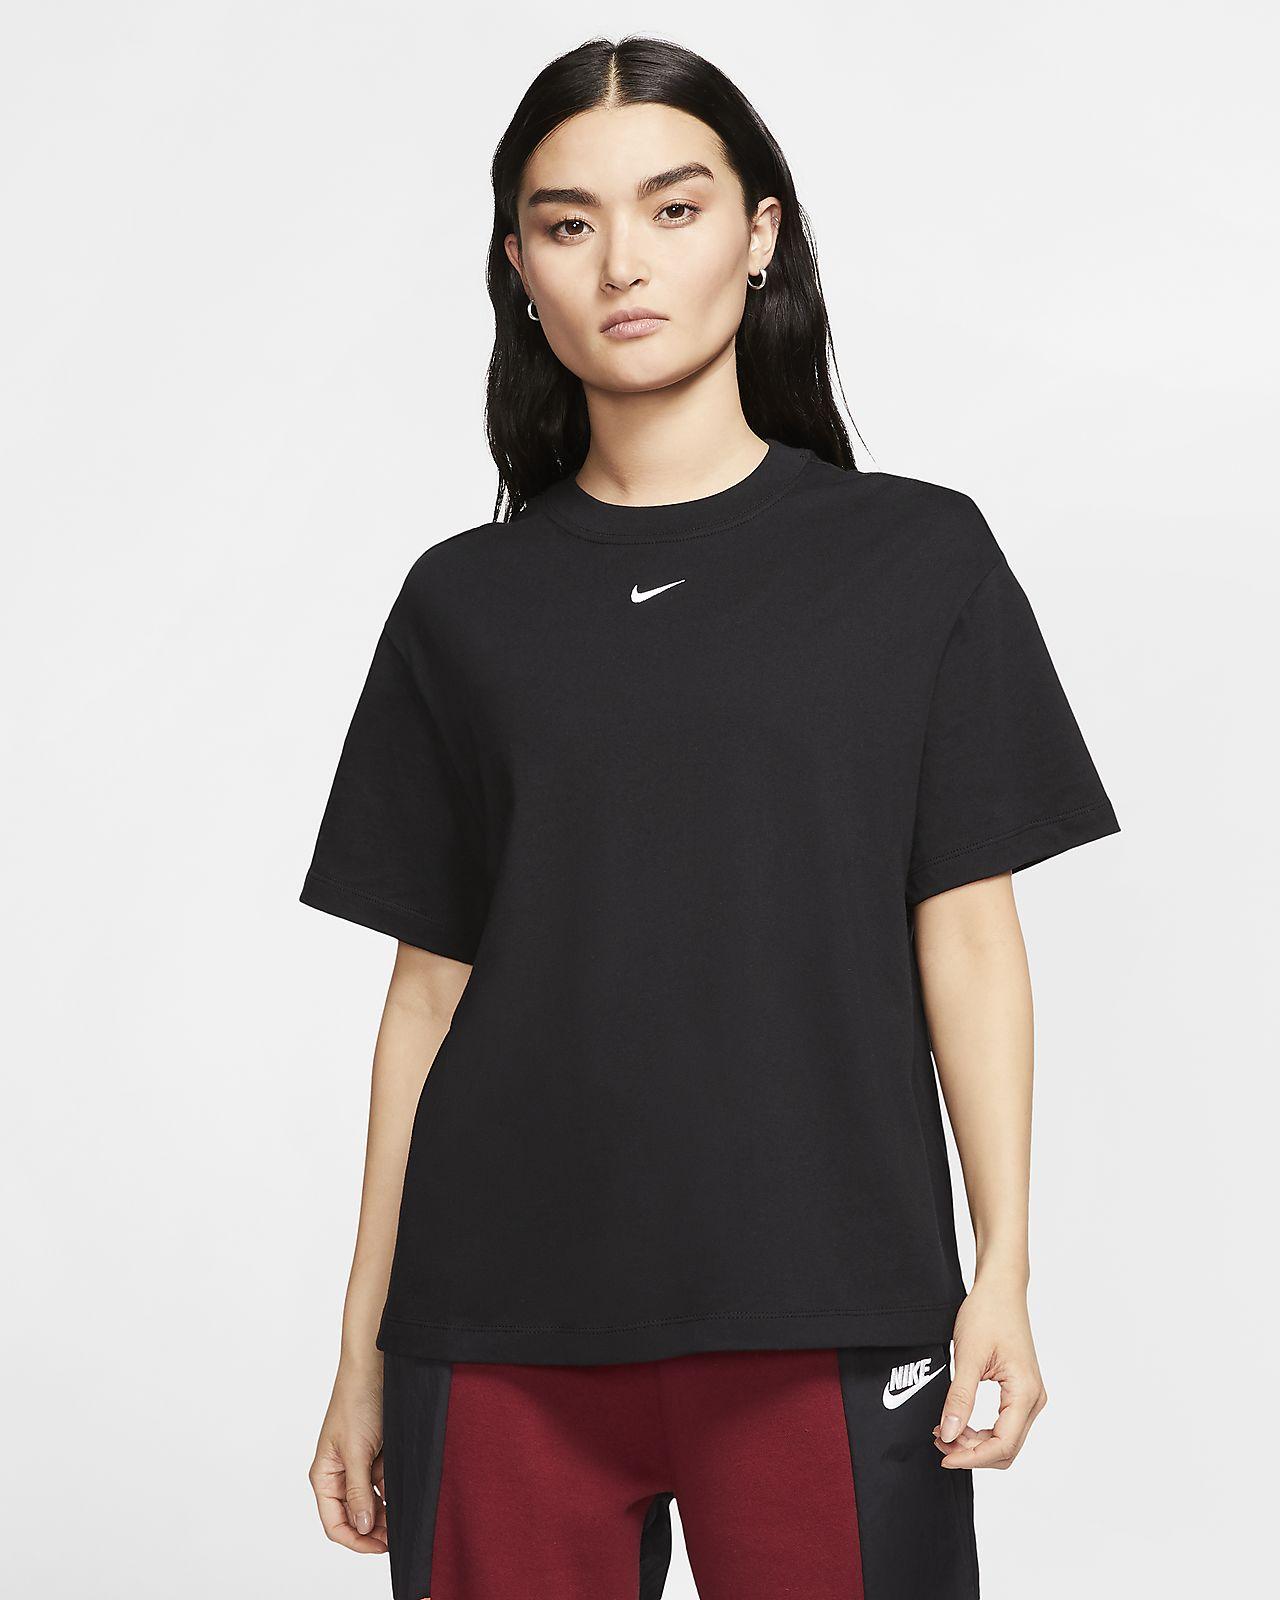 Nike Sportswear Essentials 女子短袖上衣